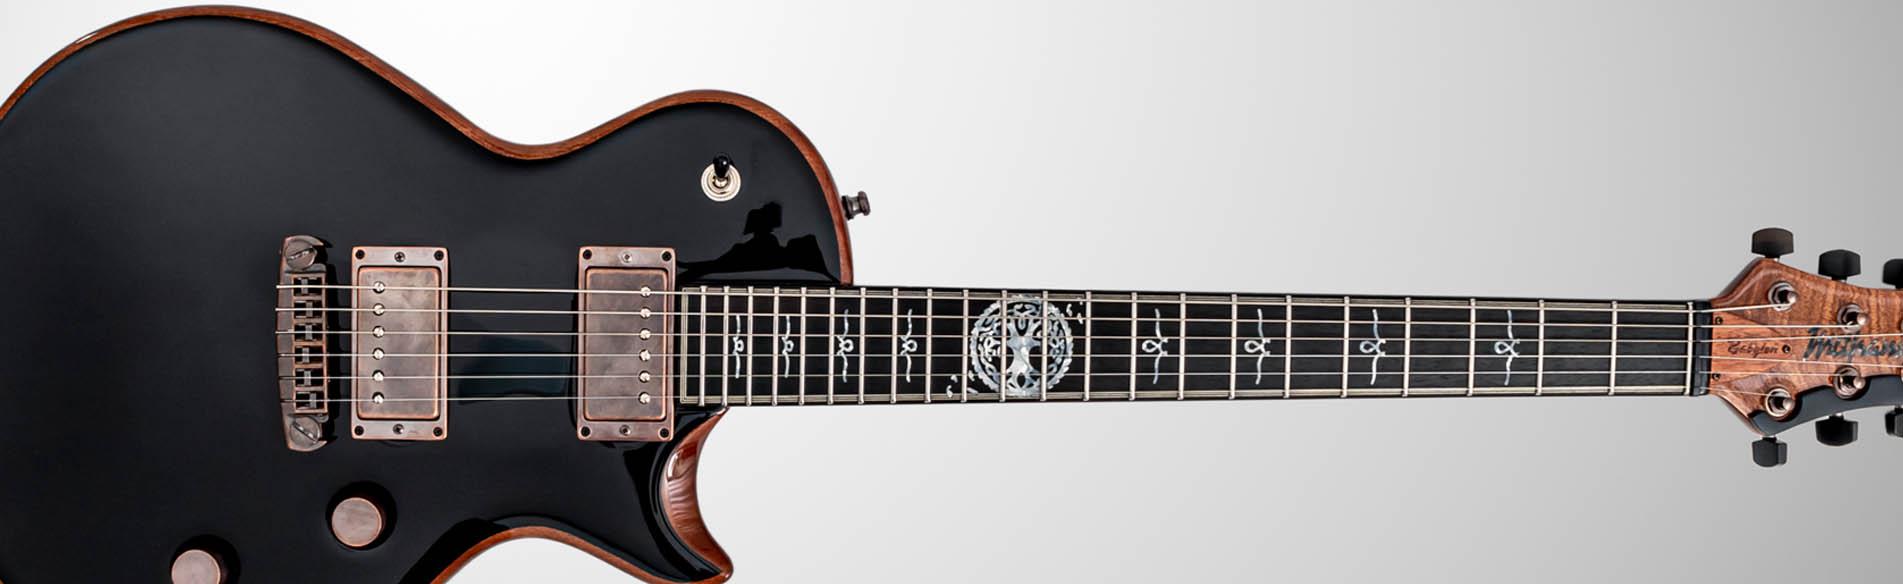 Mithans-Guitars-1627071591.jpg